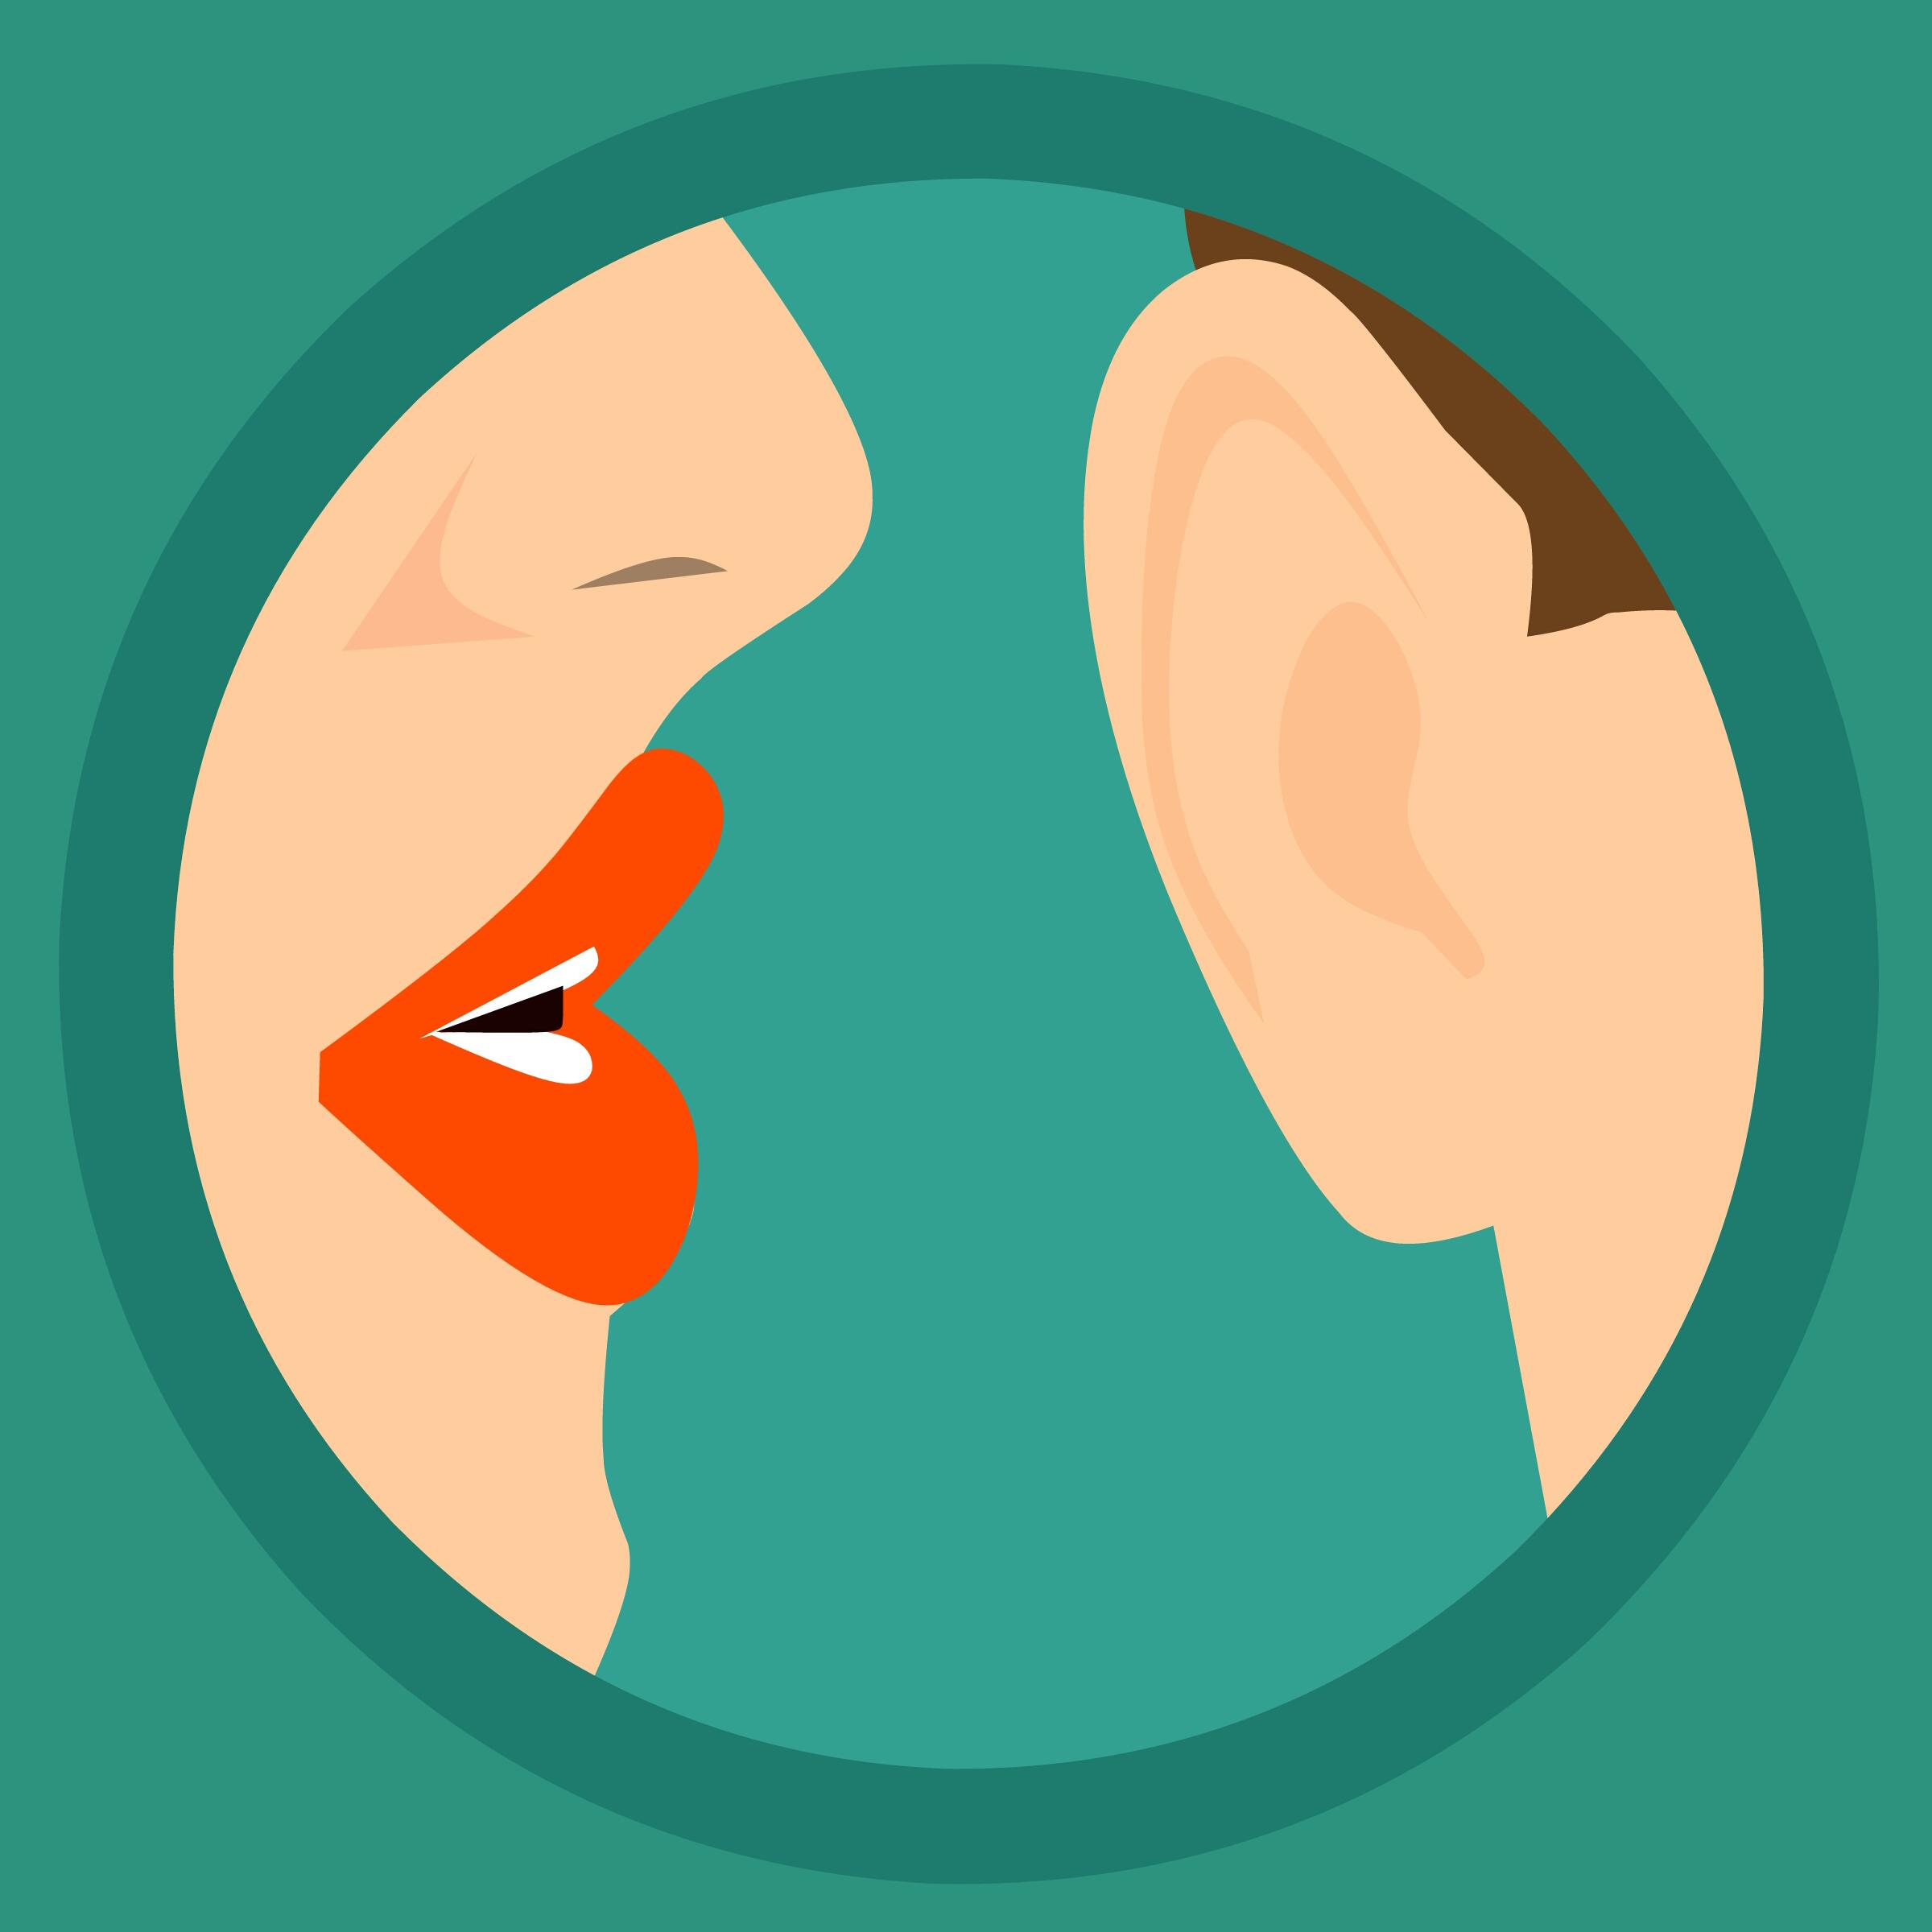 free images secret  whispering  ear  woman  lips  hair lips clip art black and white lips clipart shark